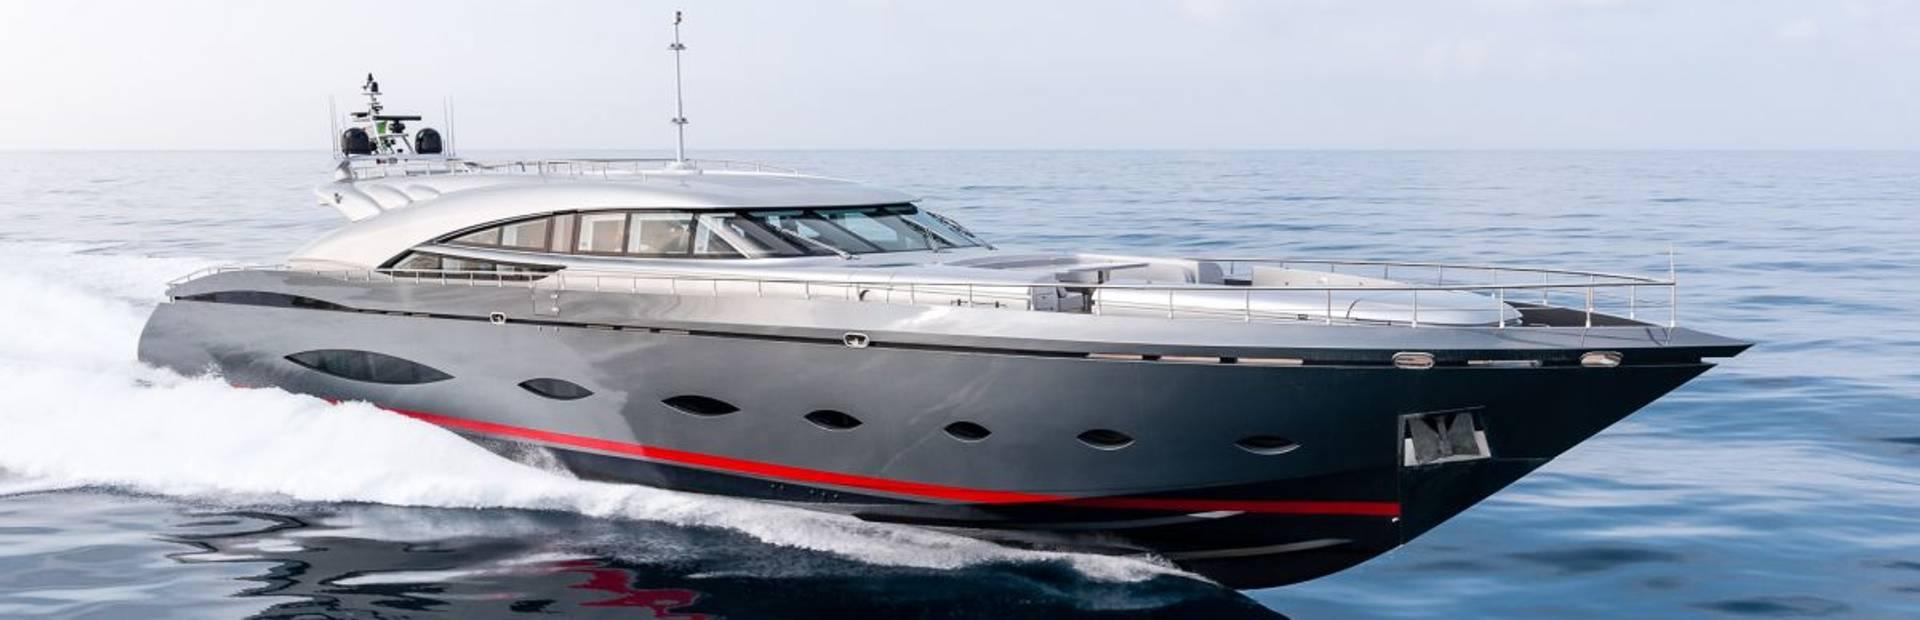 AB Yachts AB 140 Yacht Charter